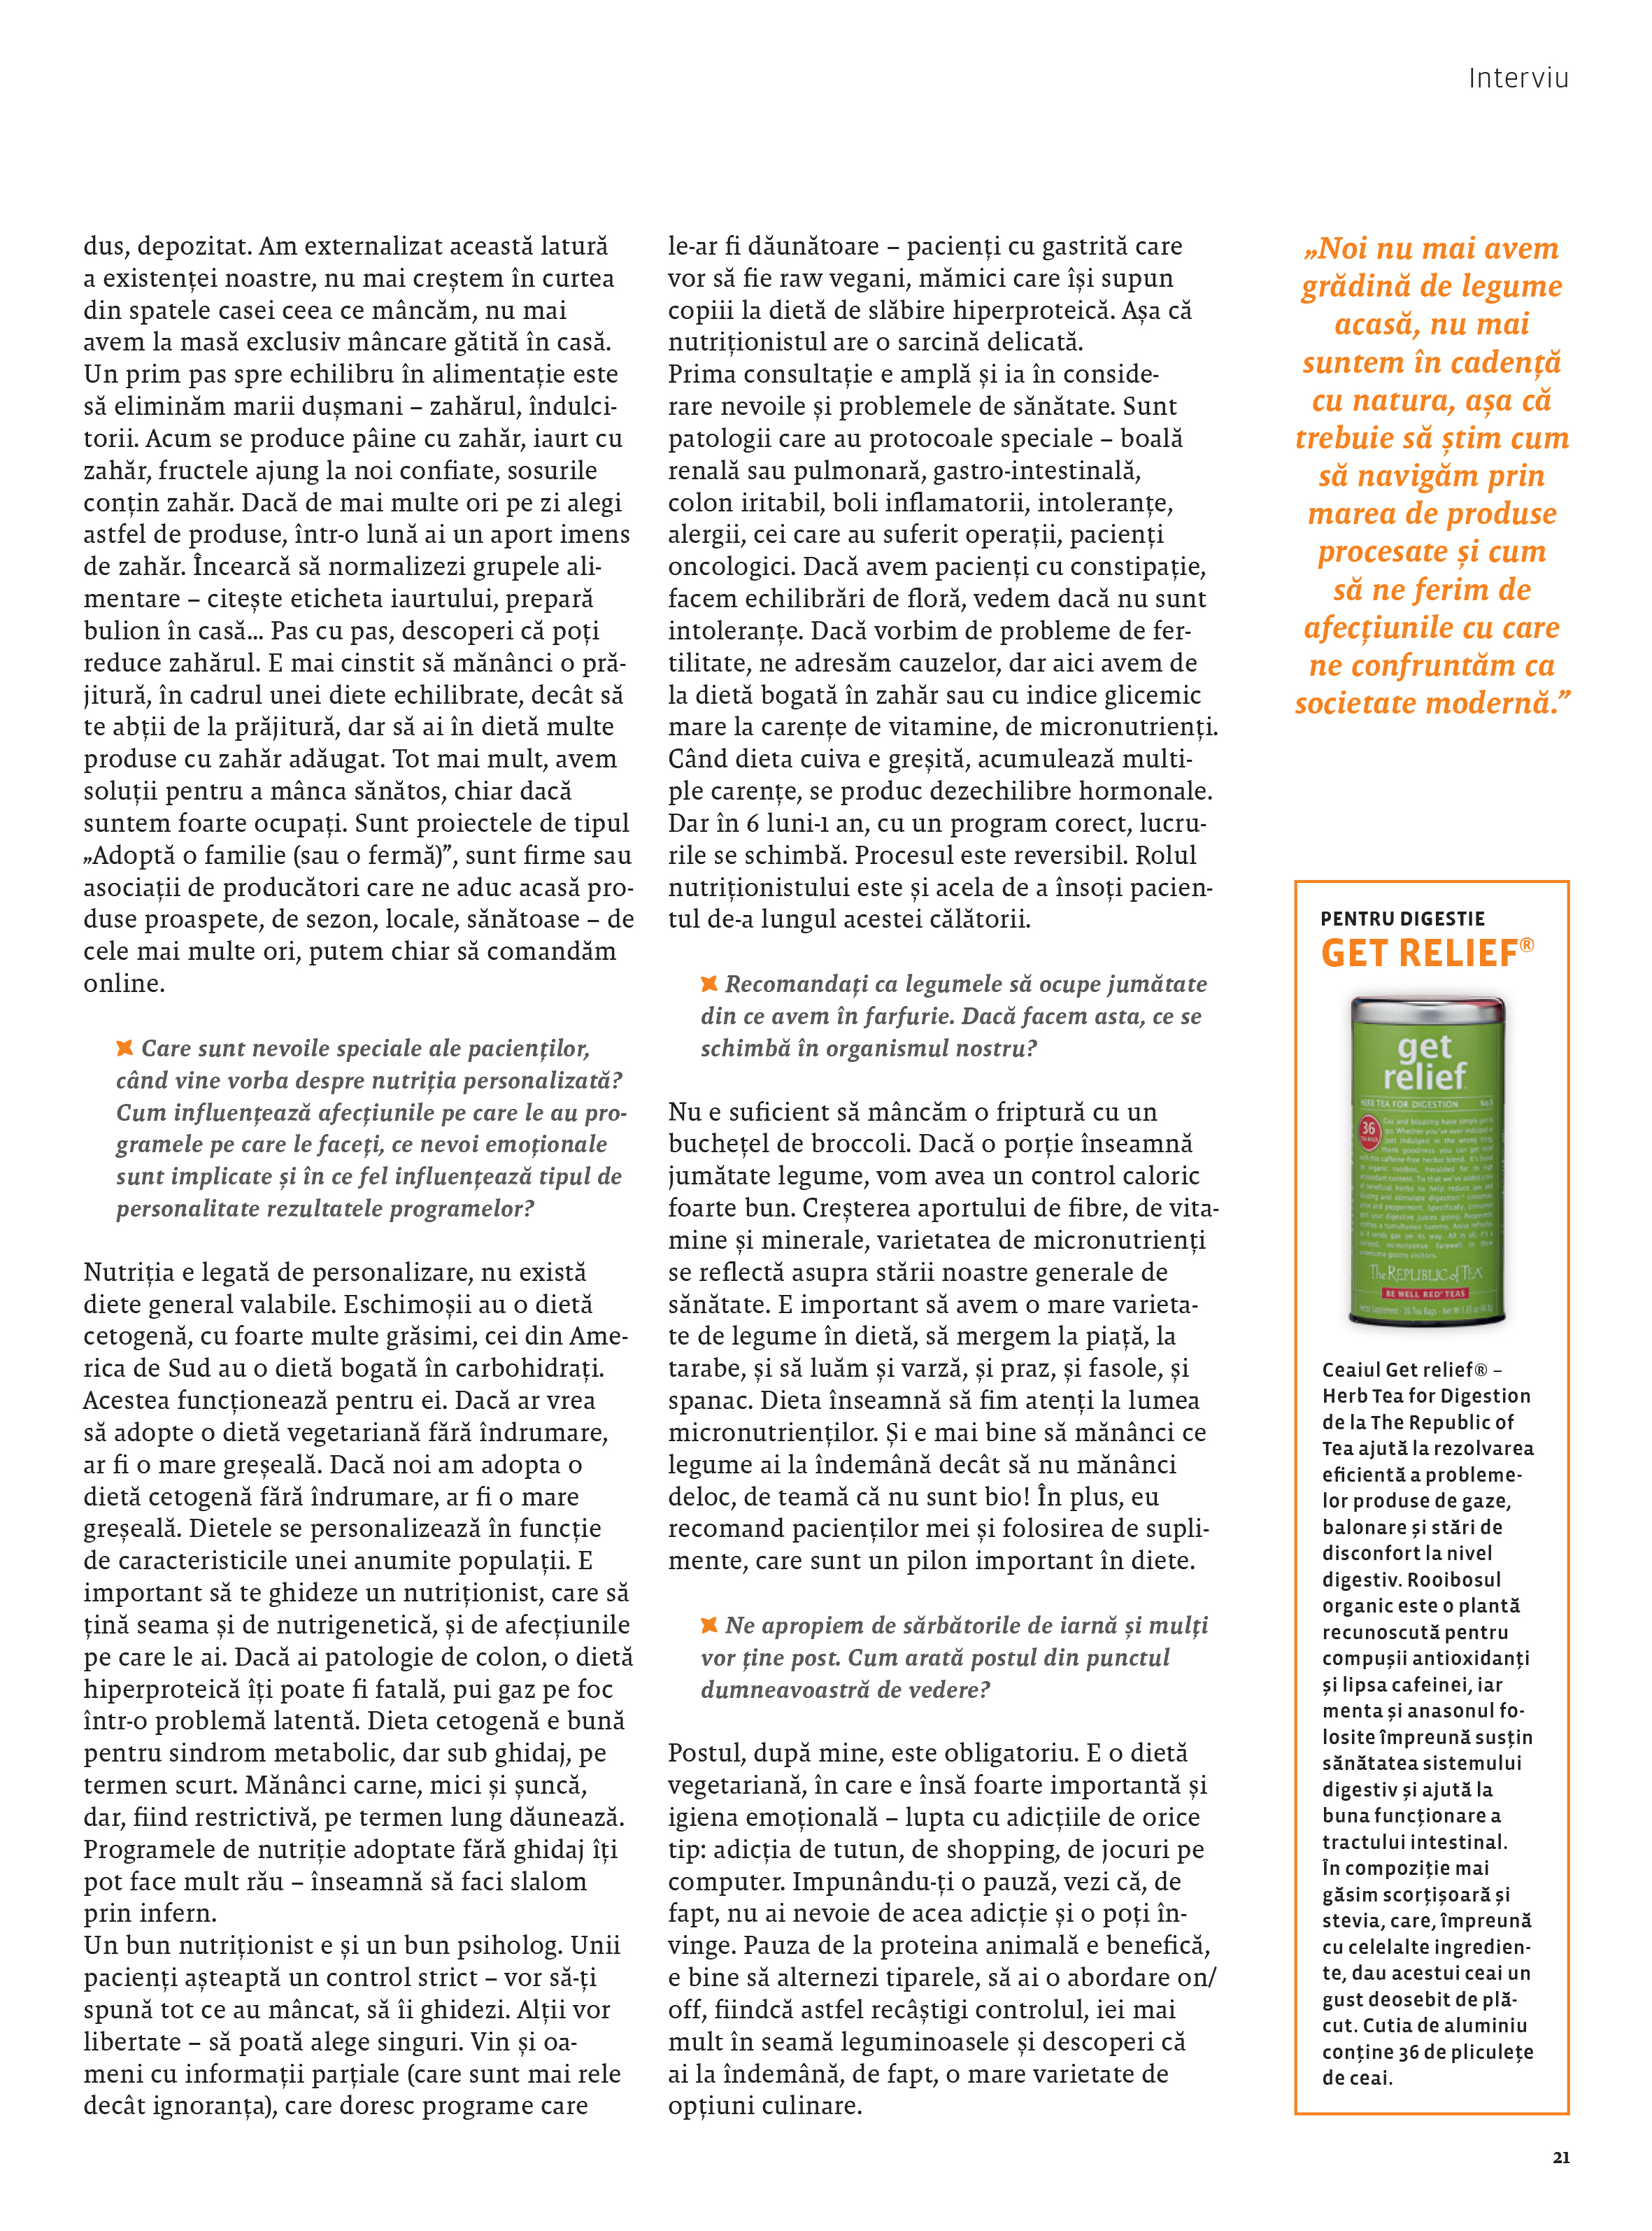 Interviu_Dr_Ruxandra_Plesea